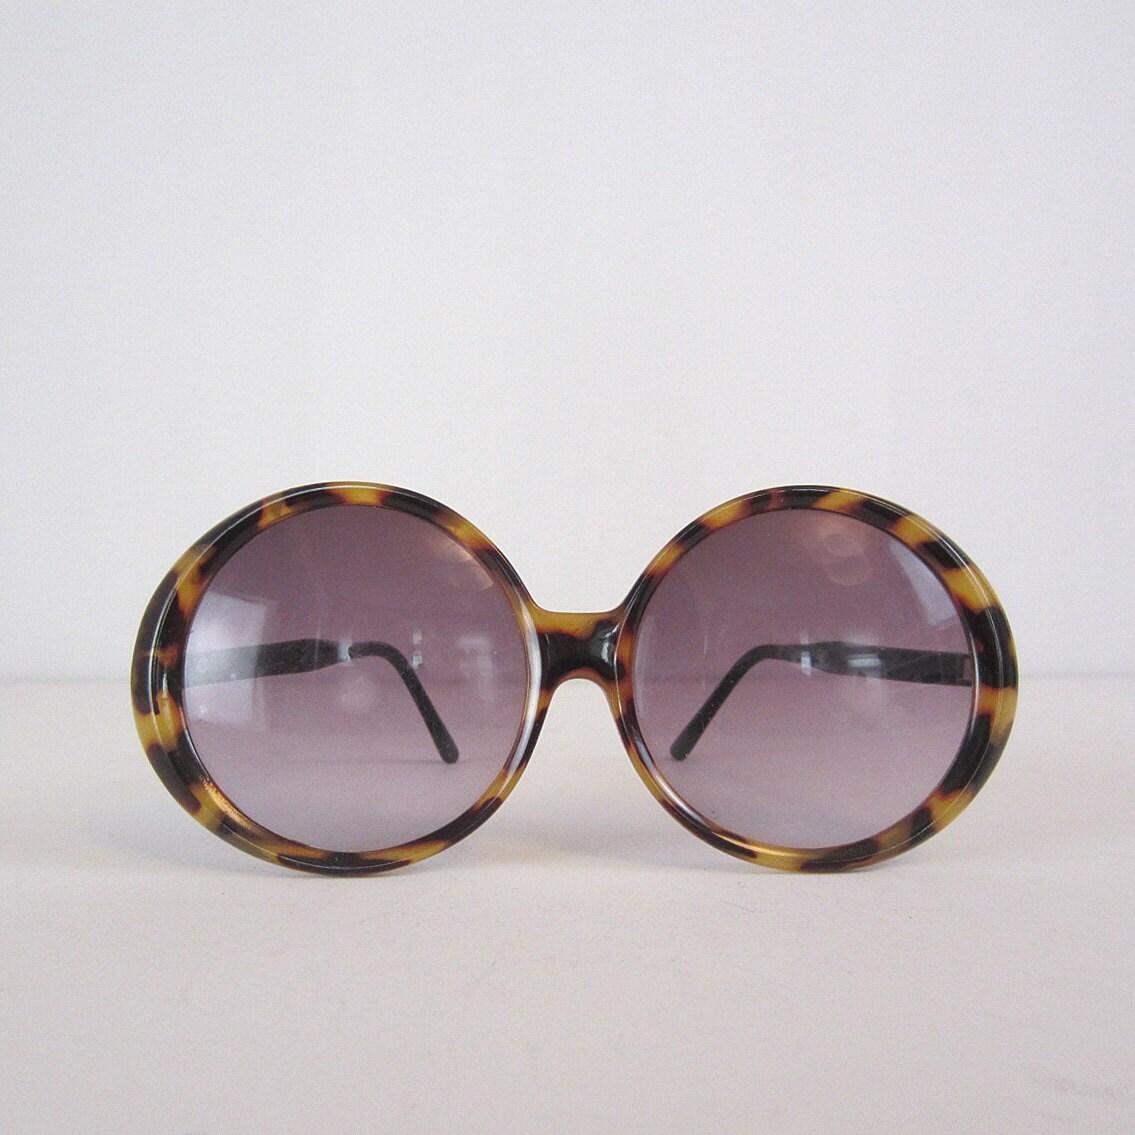 Vintage 70s Oversized Sunglasses. Tortoiseshell. Round Frame.